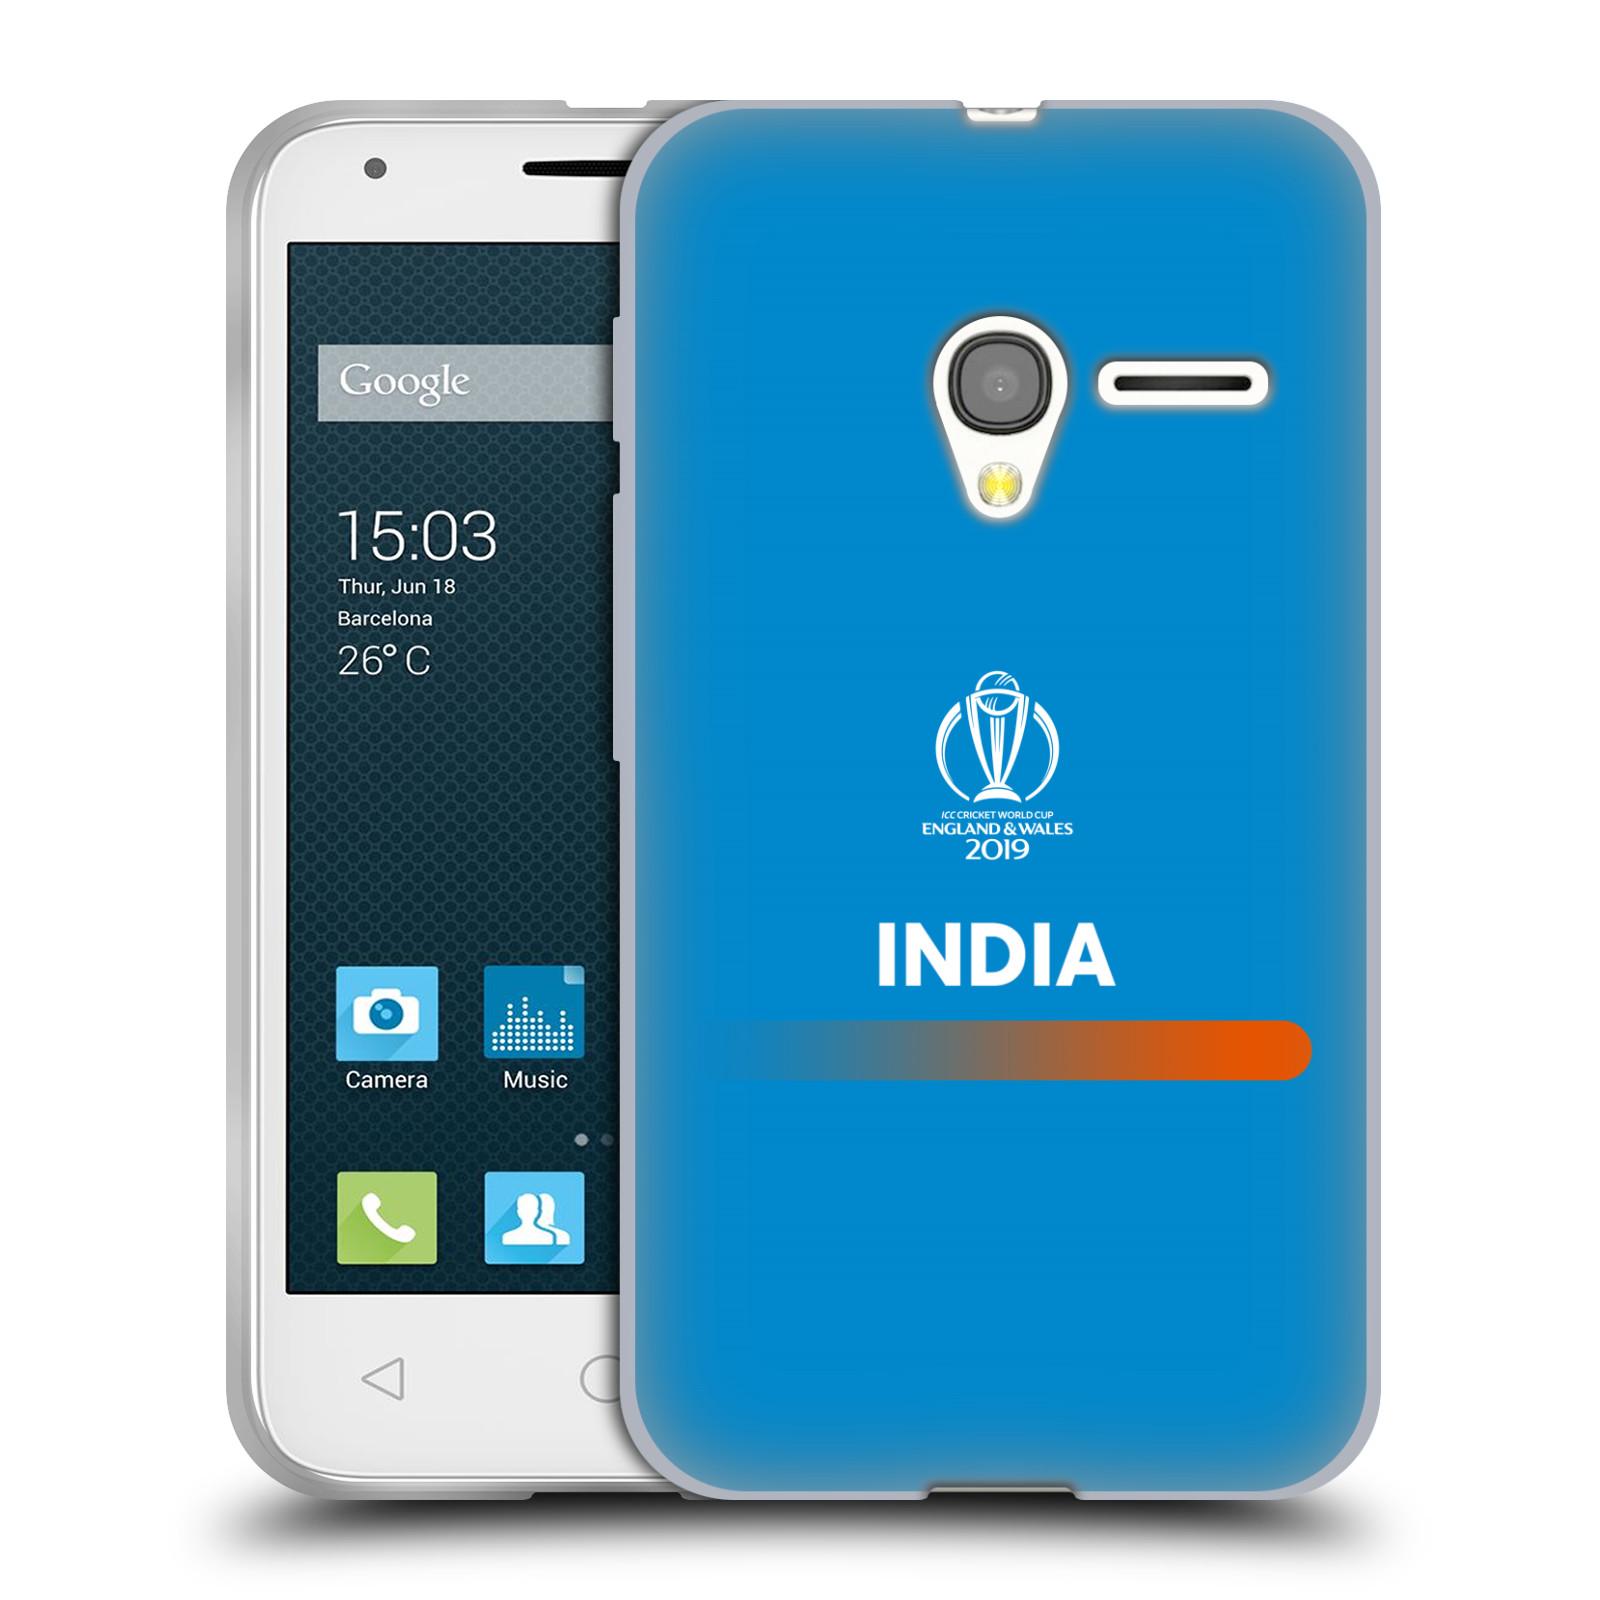 OFFICIAL-ICC-INDIA-SOFT-GEL-CASE-FOR-ALCATEL-PHONES